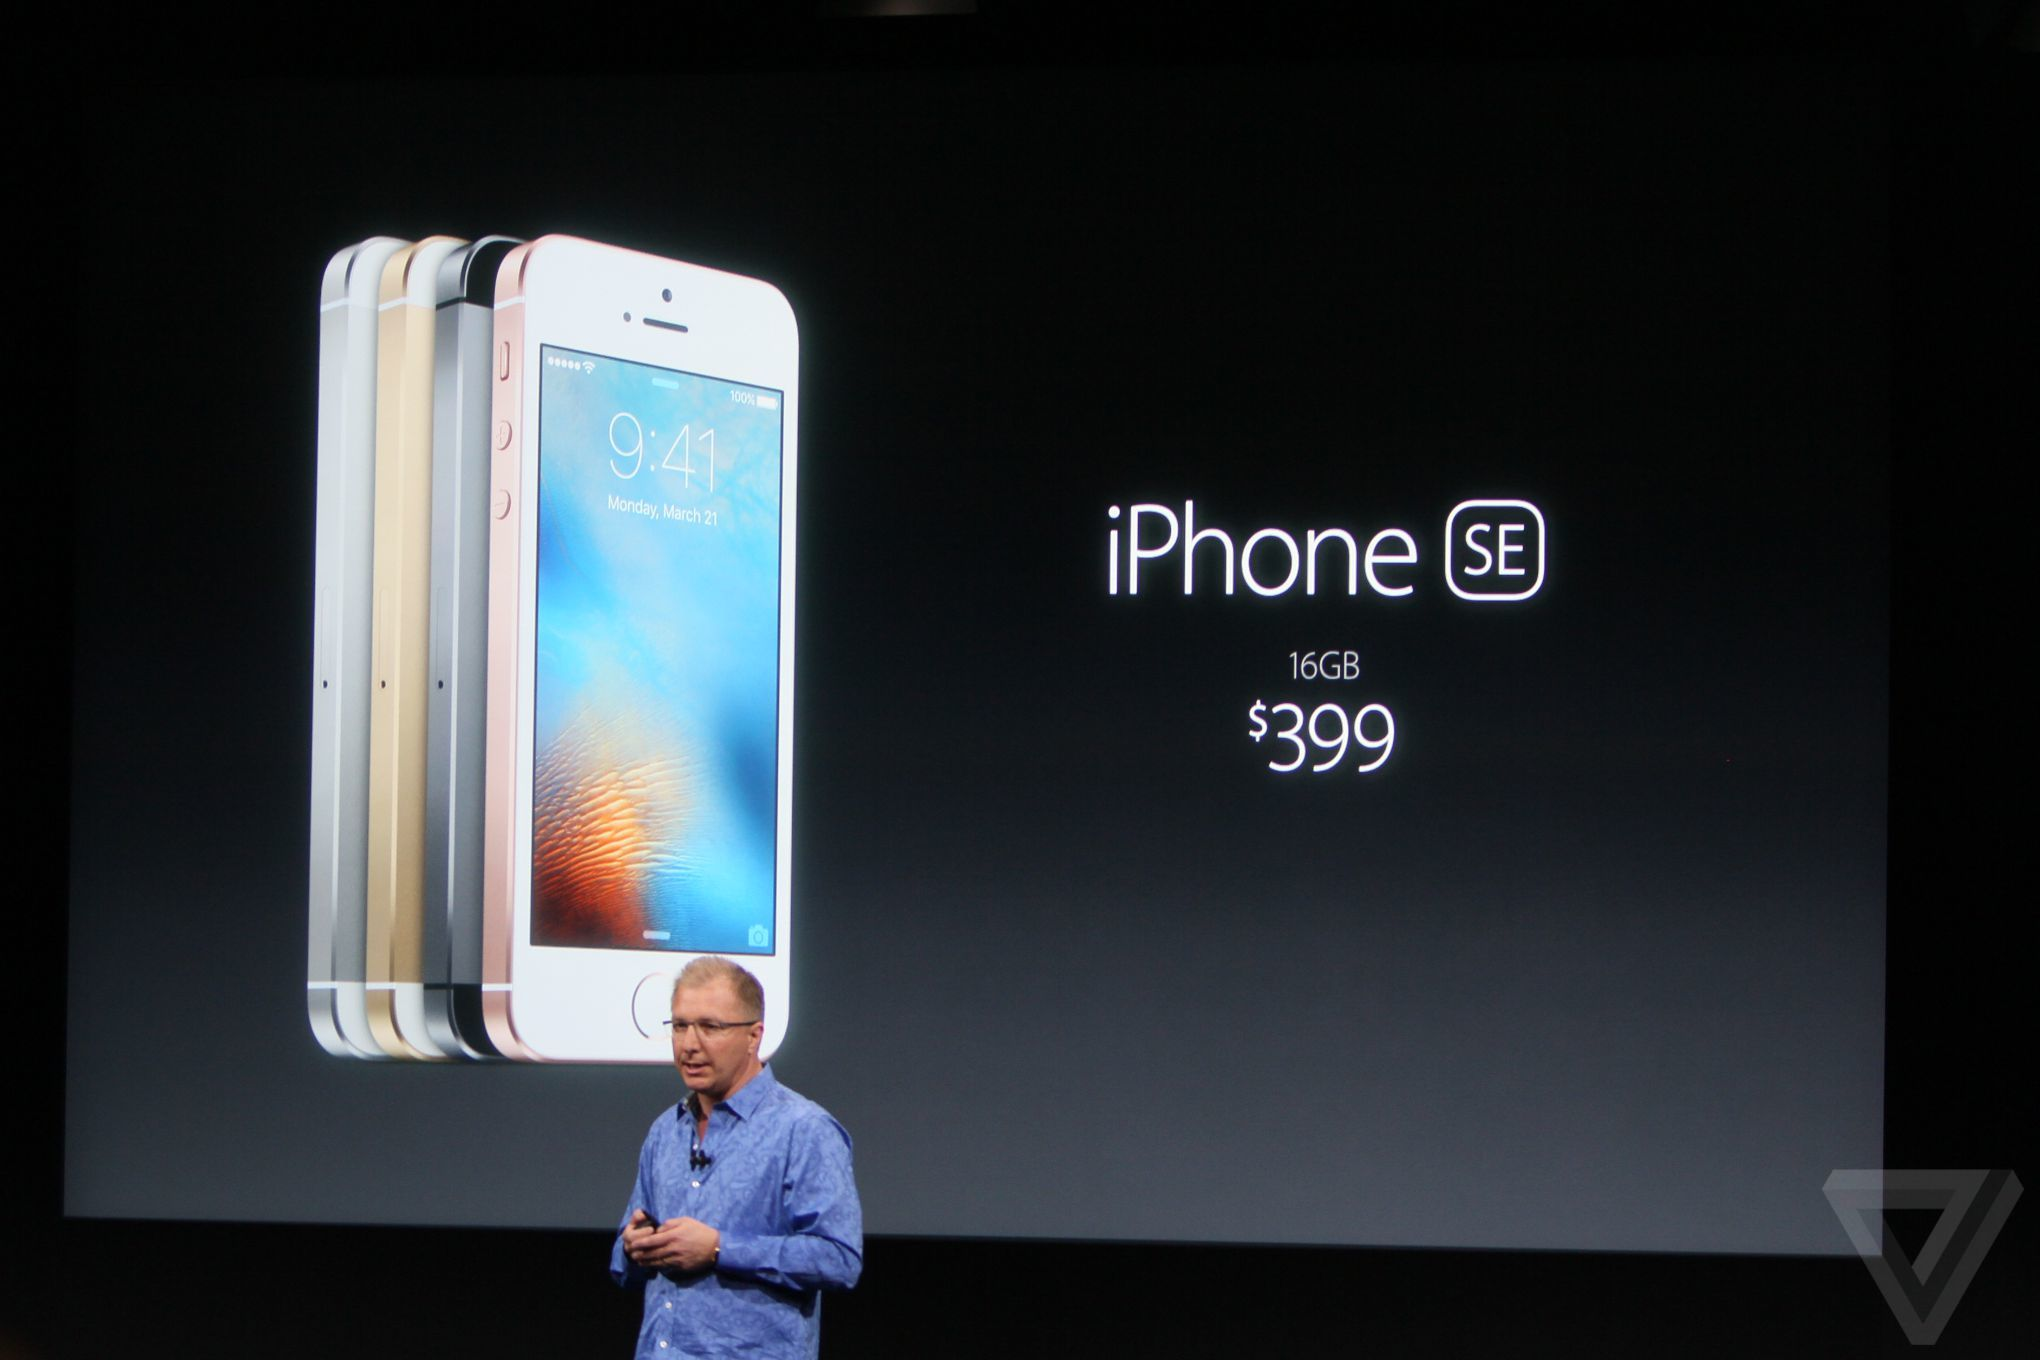 So sanh iPhone SE vs iPhone 6 - 1